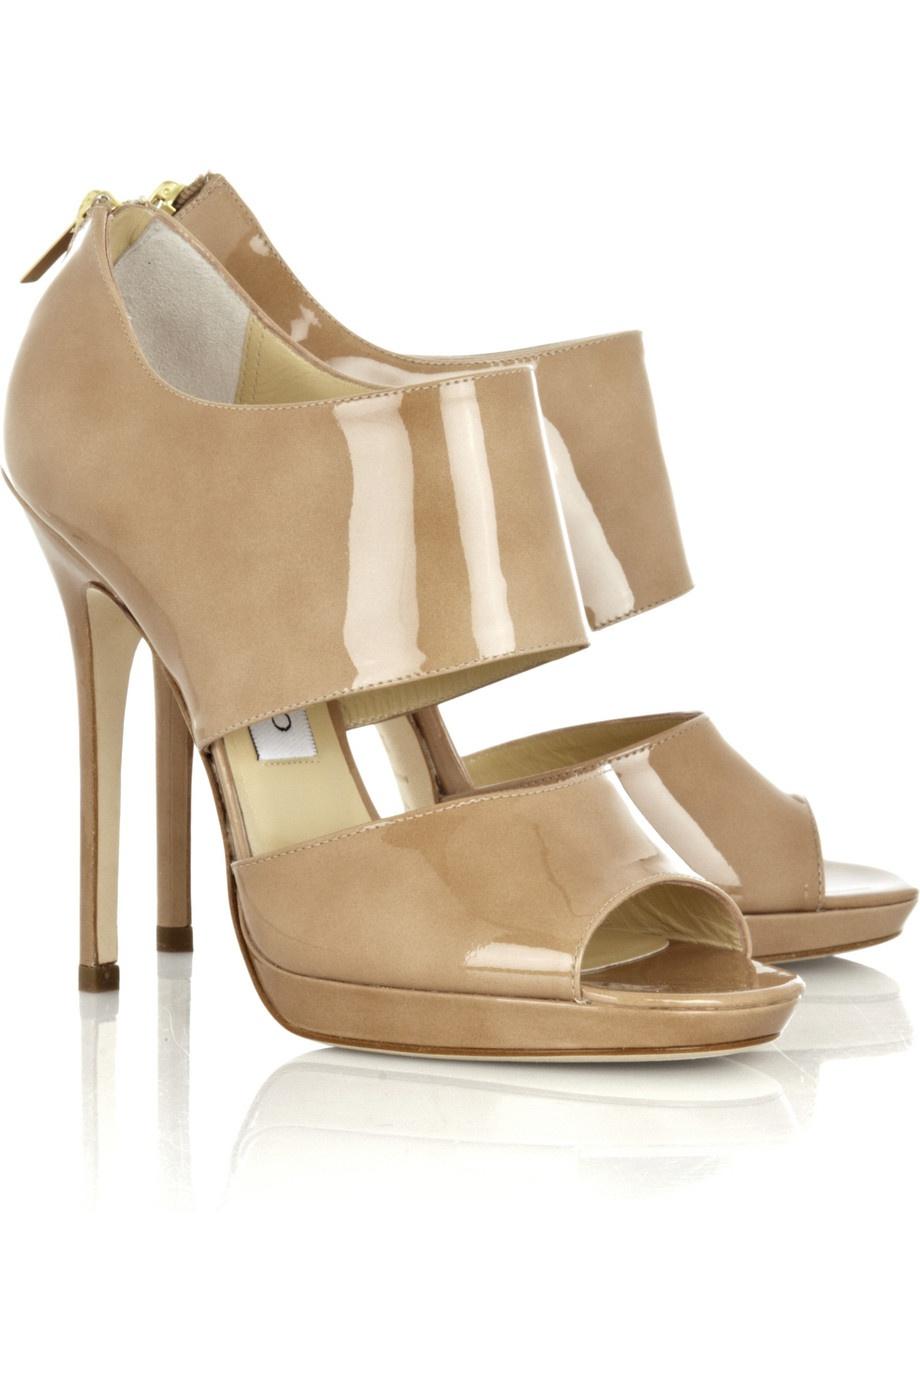 Туфли-босоножки Jimmy Choo, размер 36.5